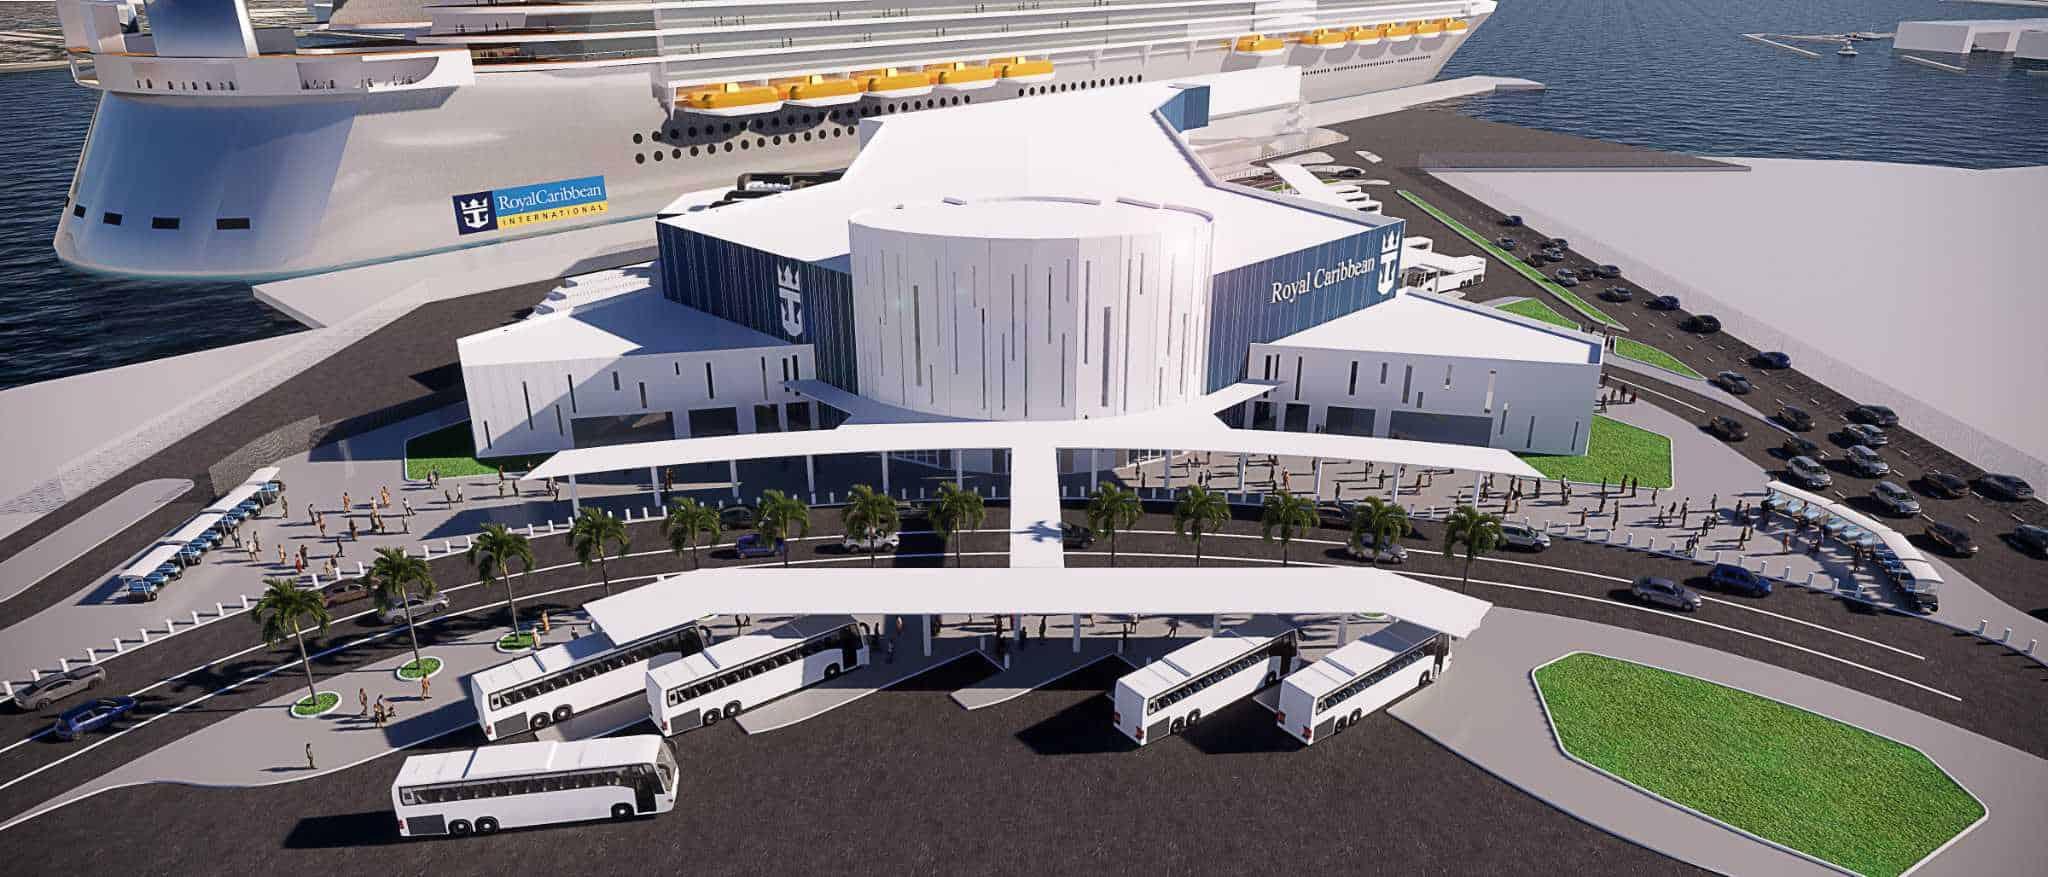 royal caribbean galveston terminal rendering